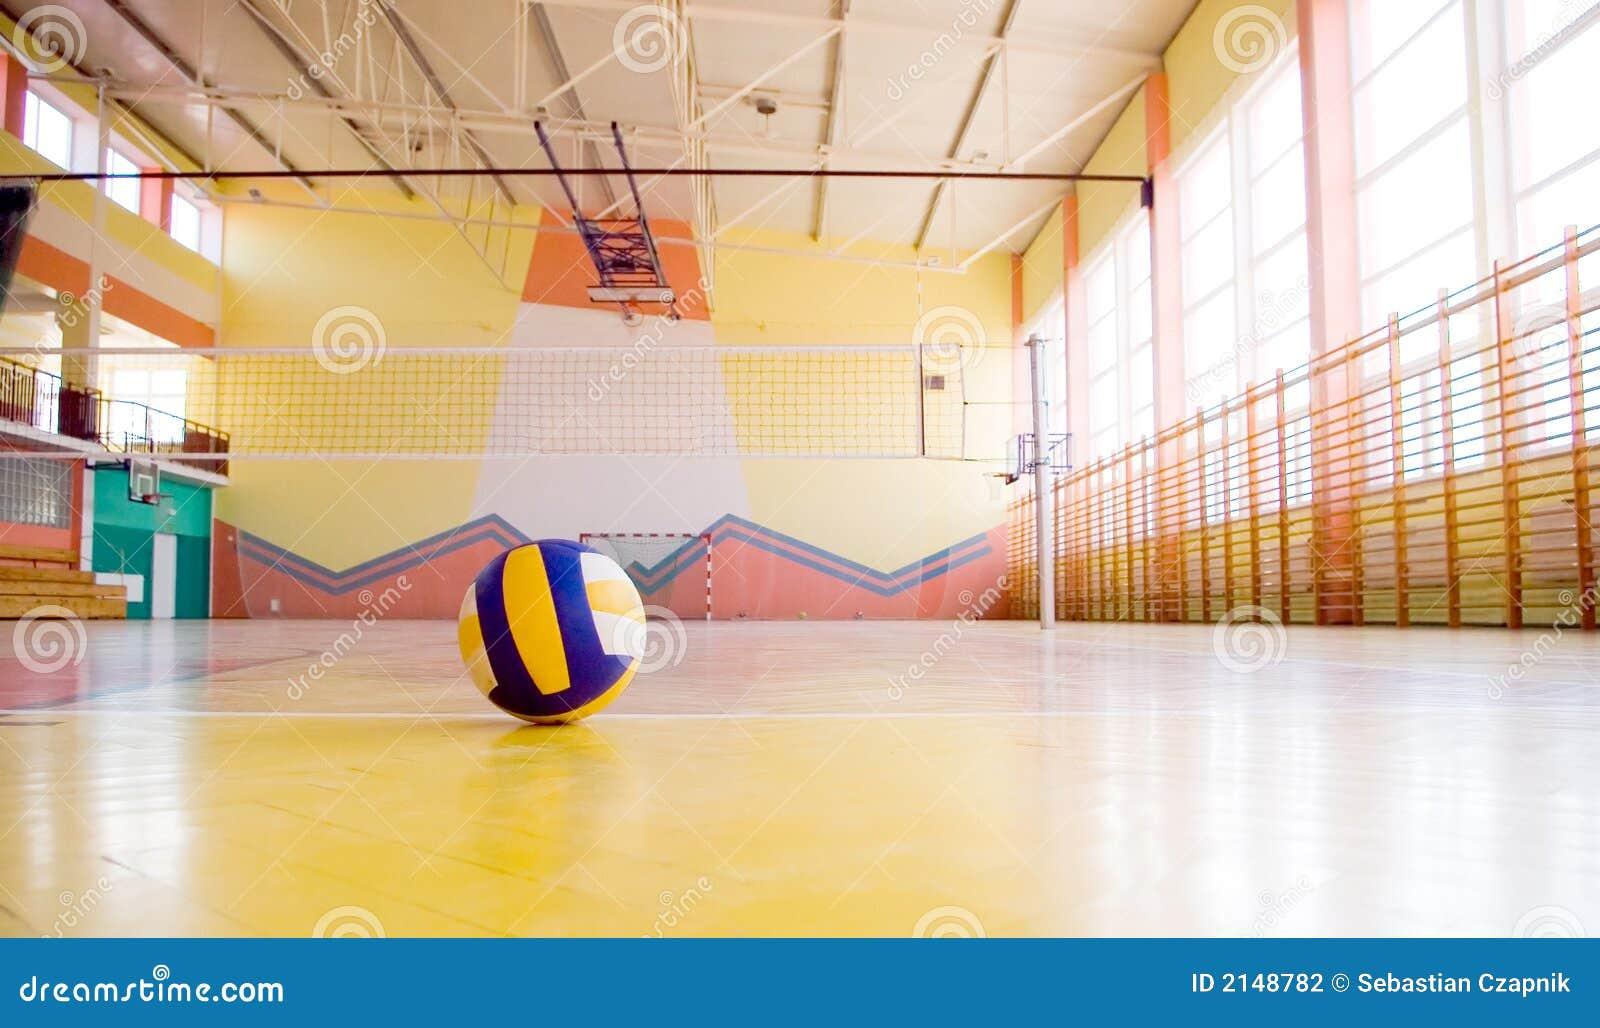 Voleibol en una gimnasia.